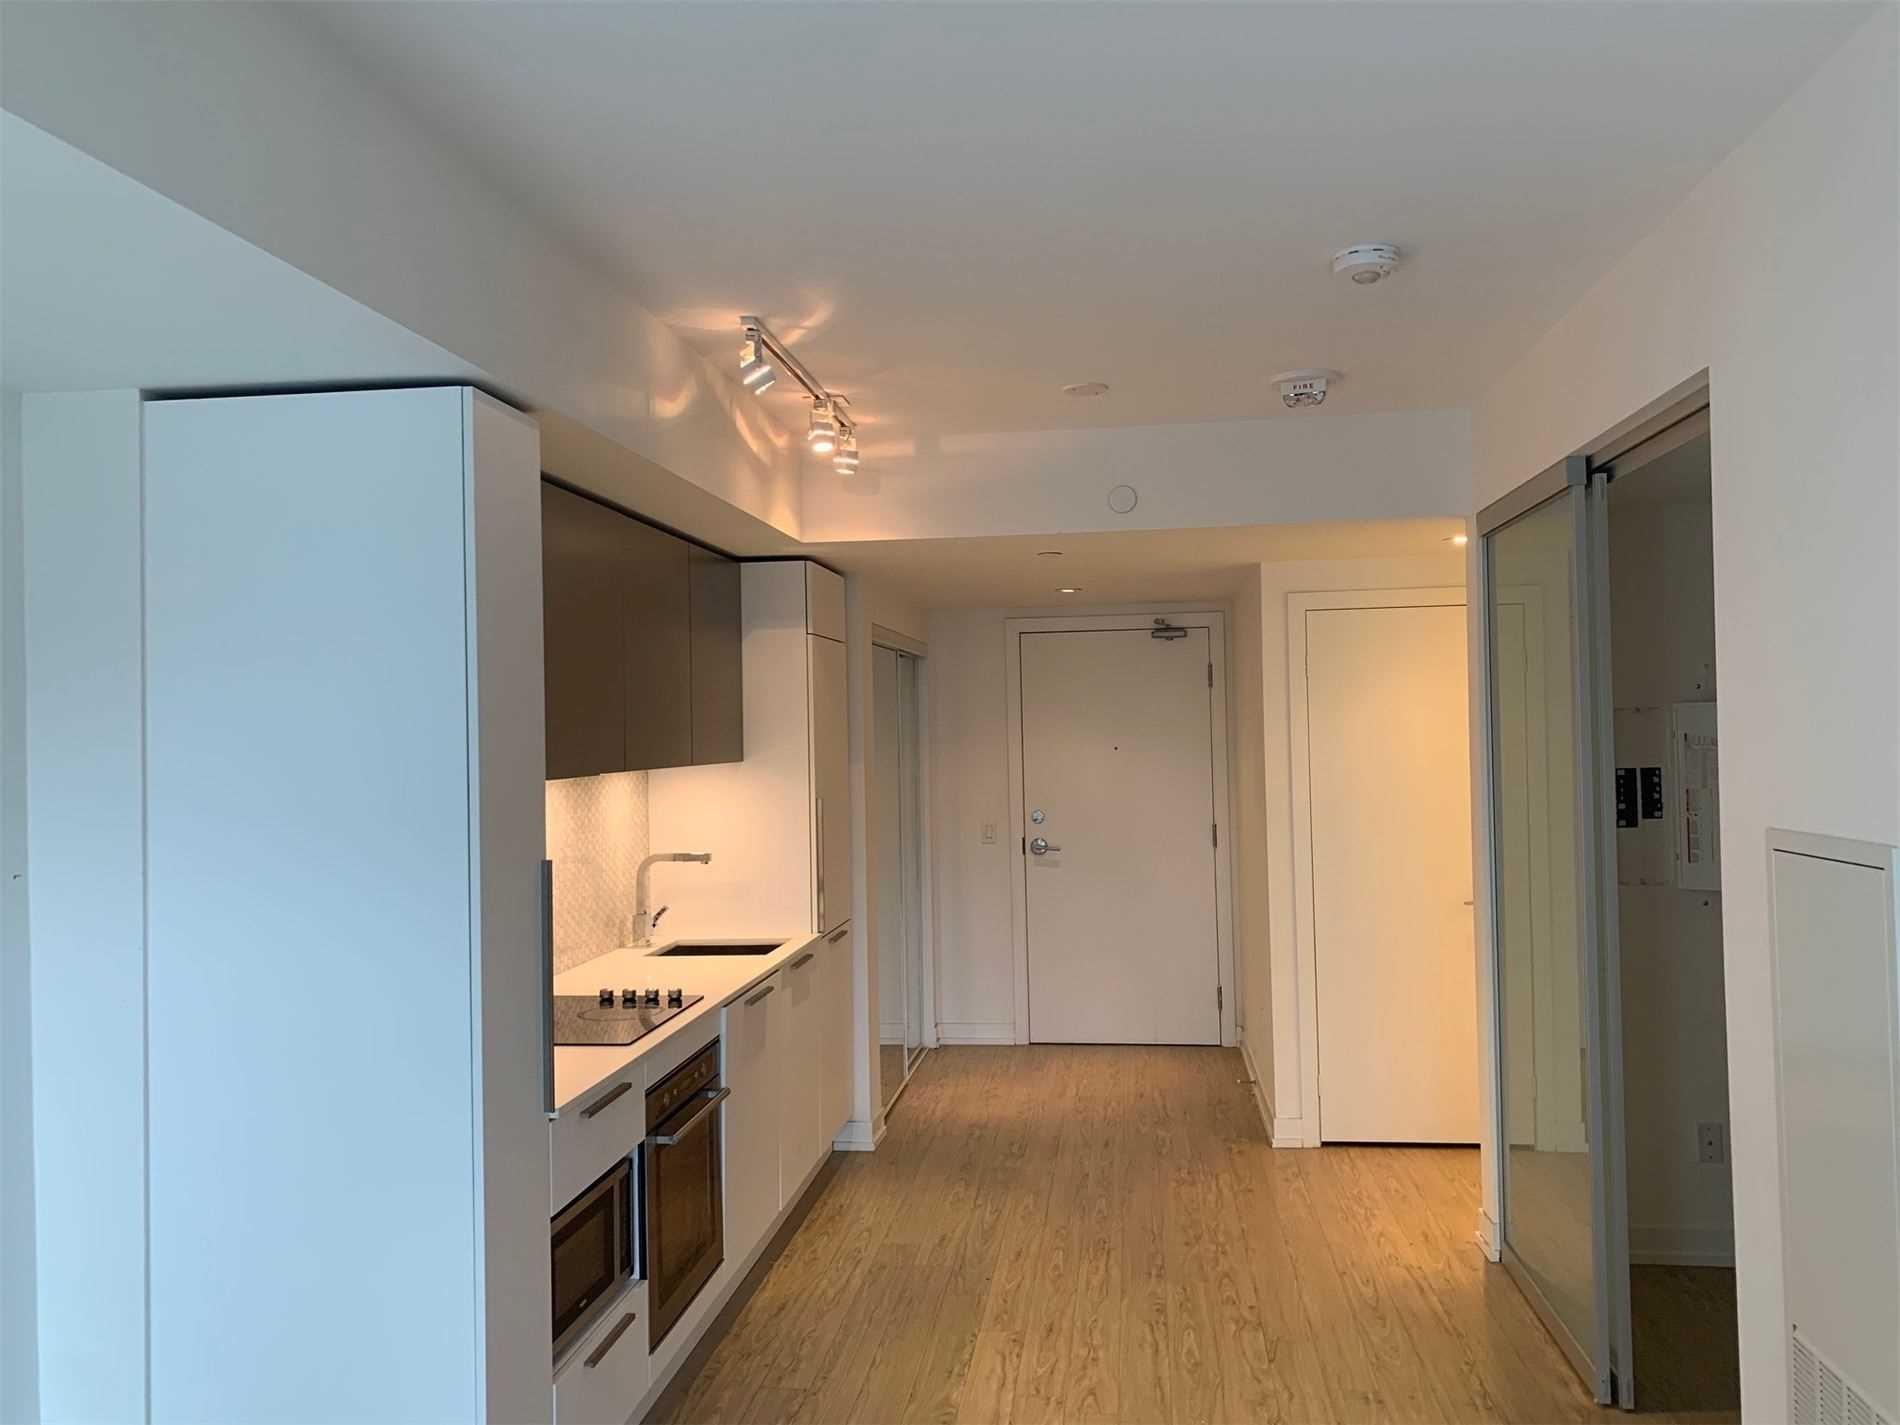 1001 - 85 Wood St - Church-Yonge Corridor Condo Apt for sale, 1 Bedroom (C5221011) - #6